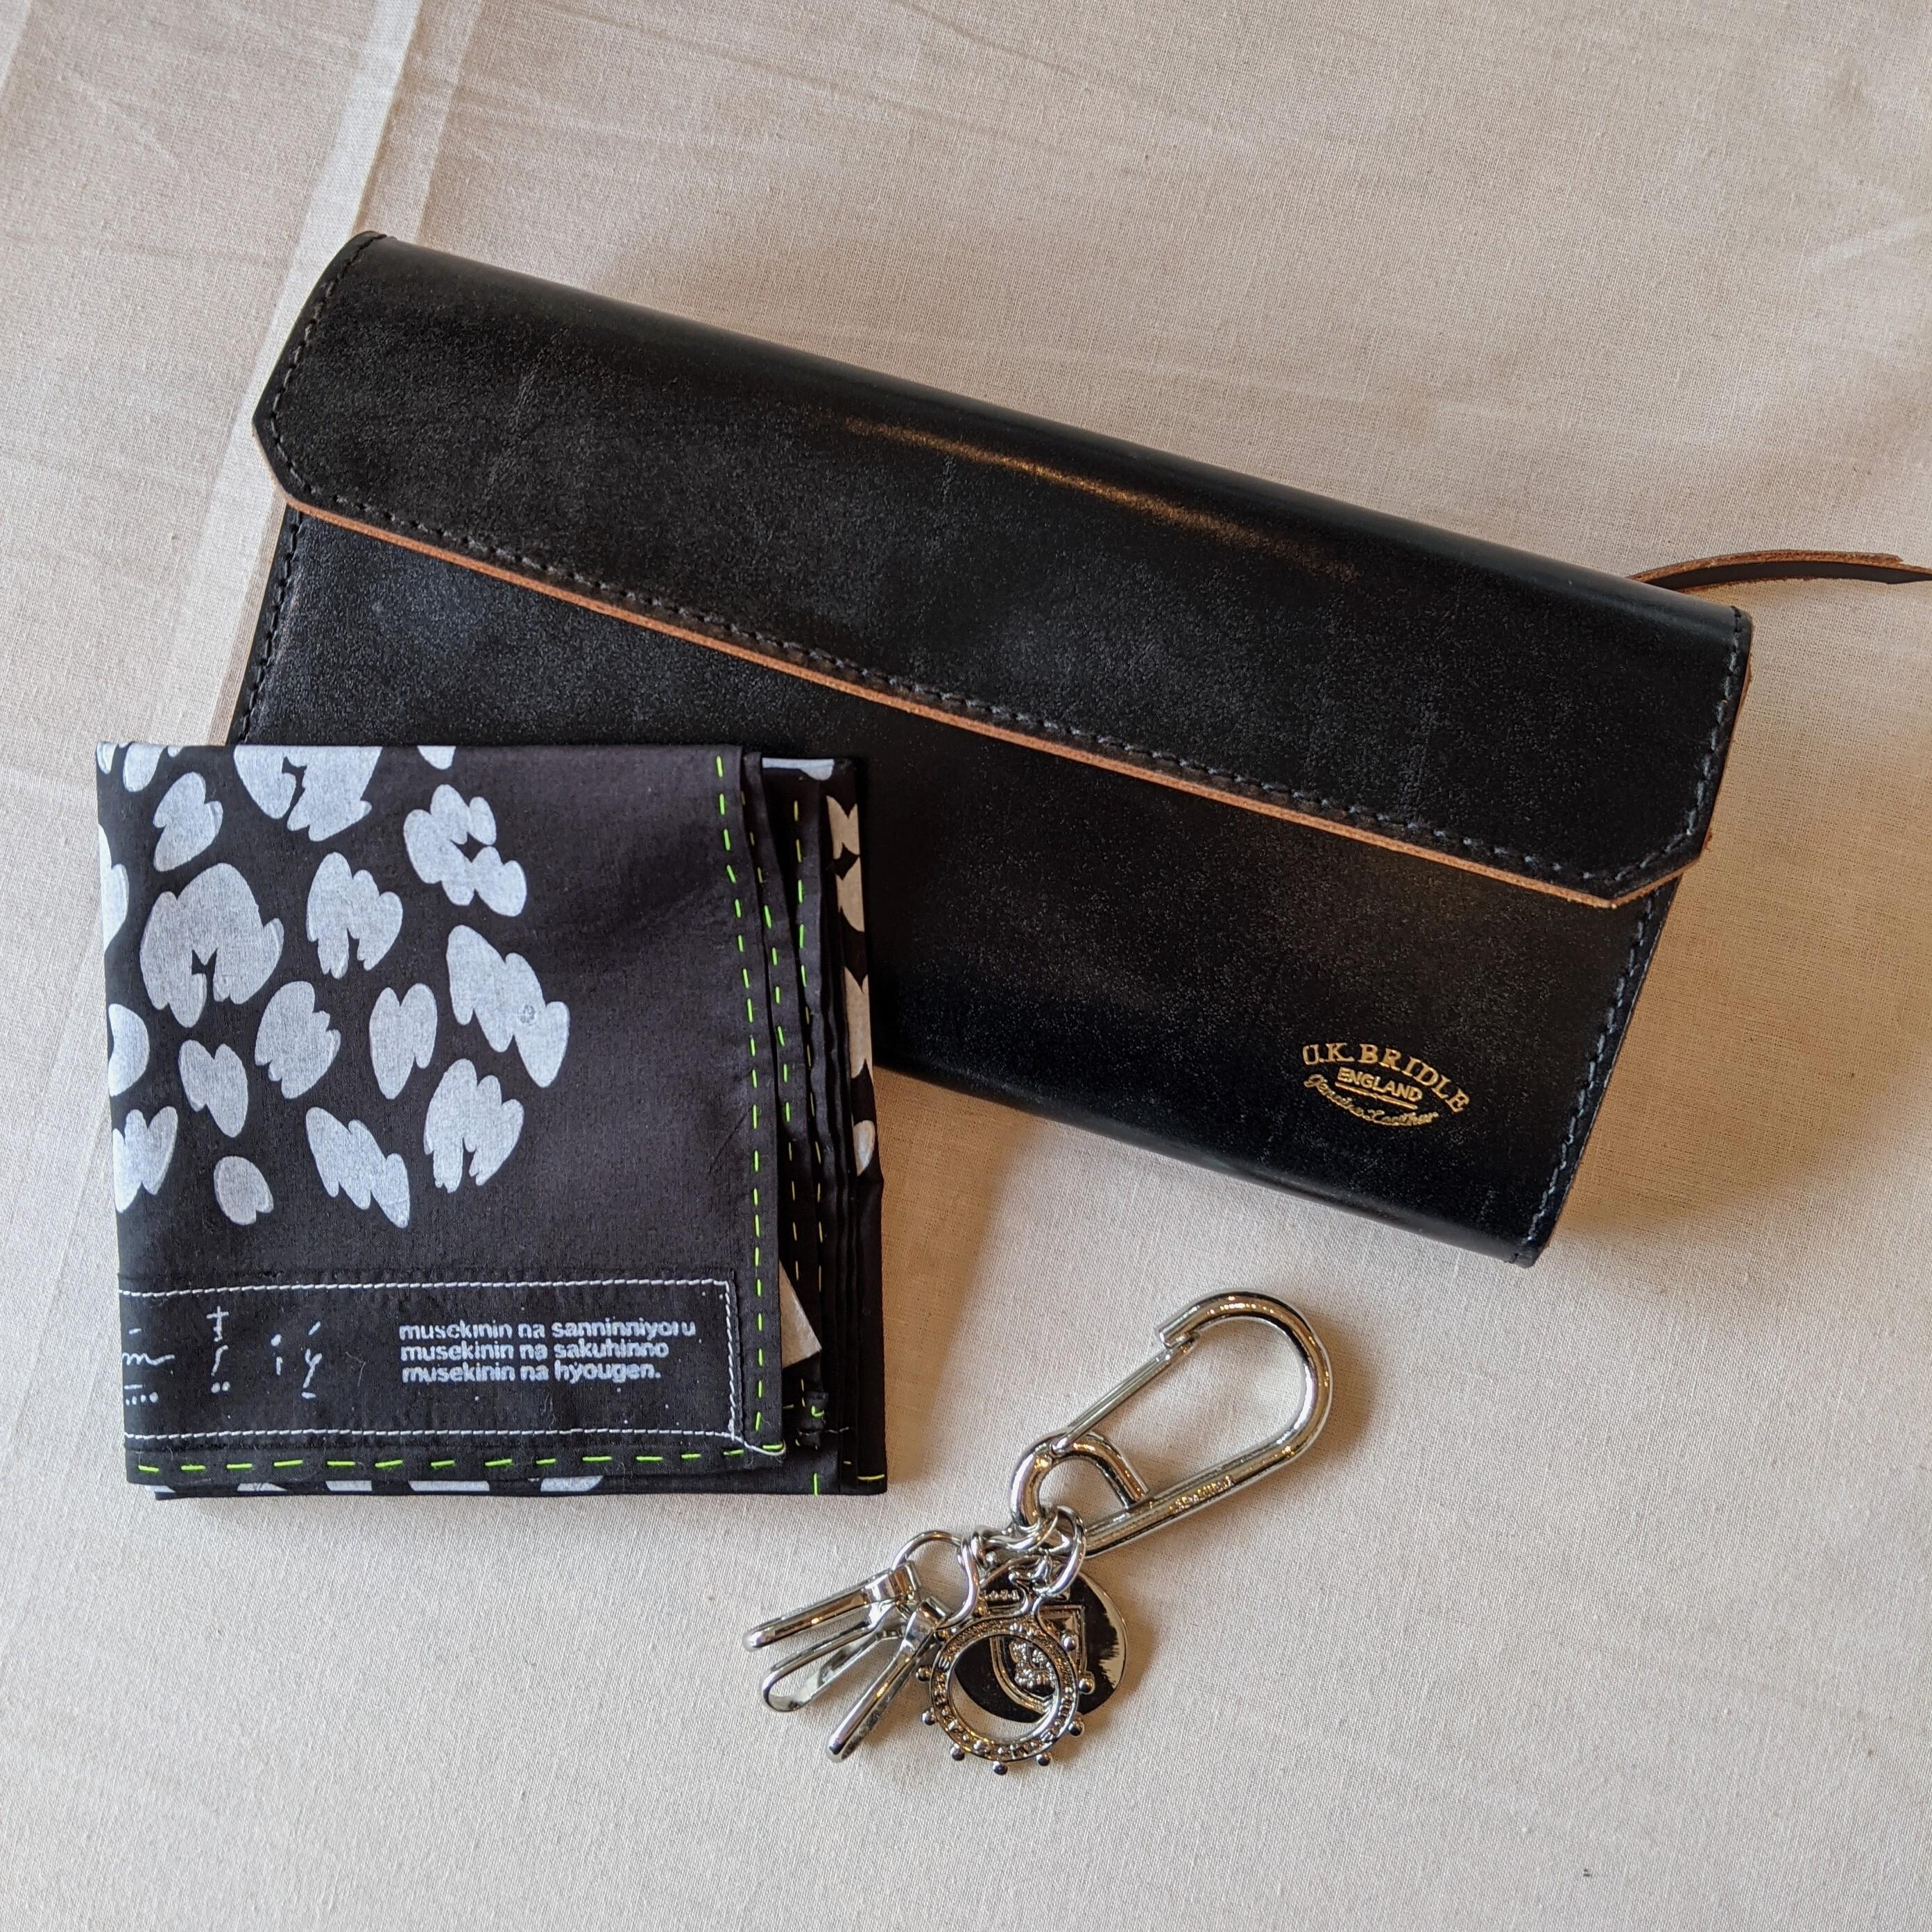 【 STRIPS 】ストライプス /  leopard handkerchief  /  ハンカチ / レオパード / シルクスクリーン